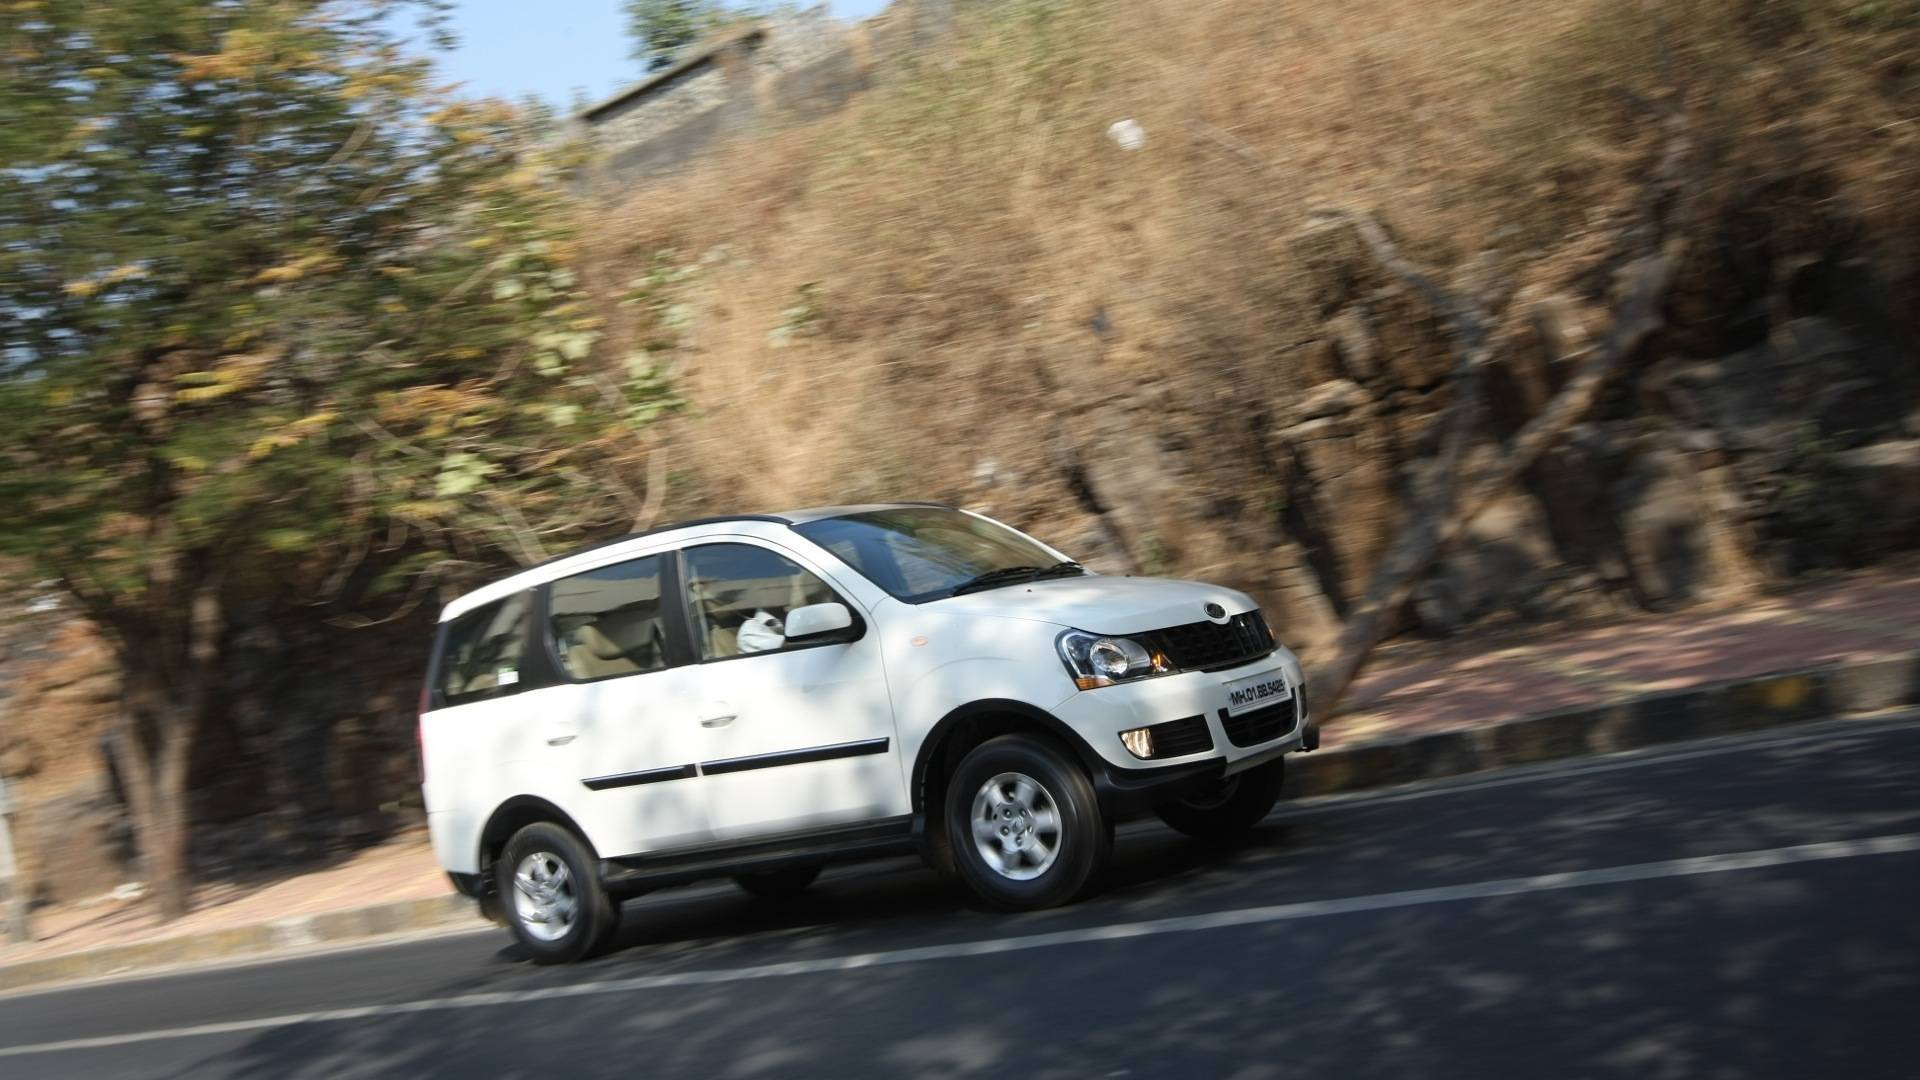 2012 Mahindra Xylo E9 roadtest